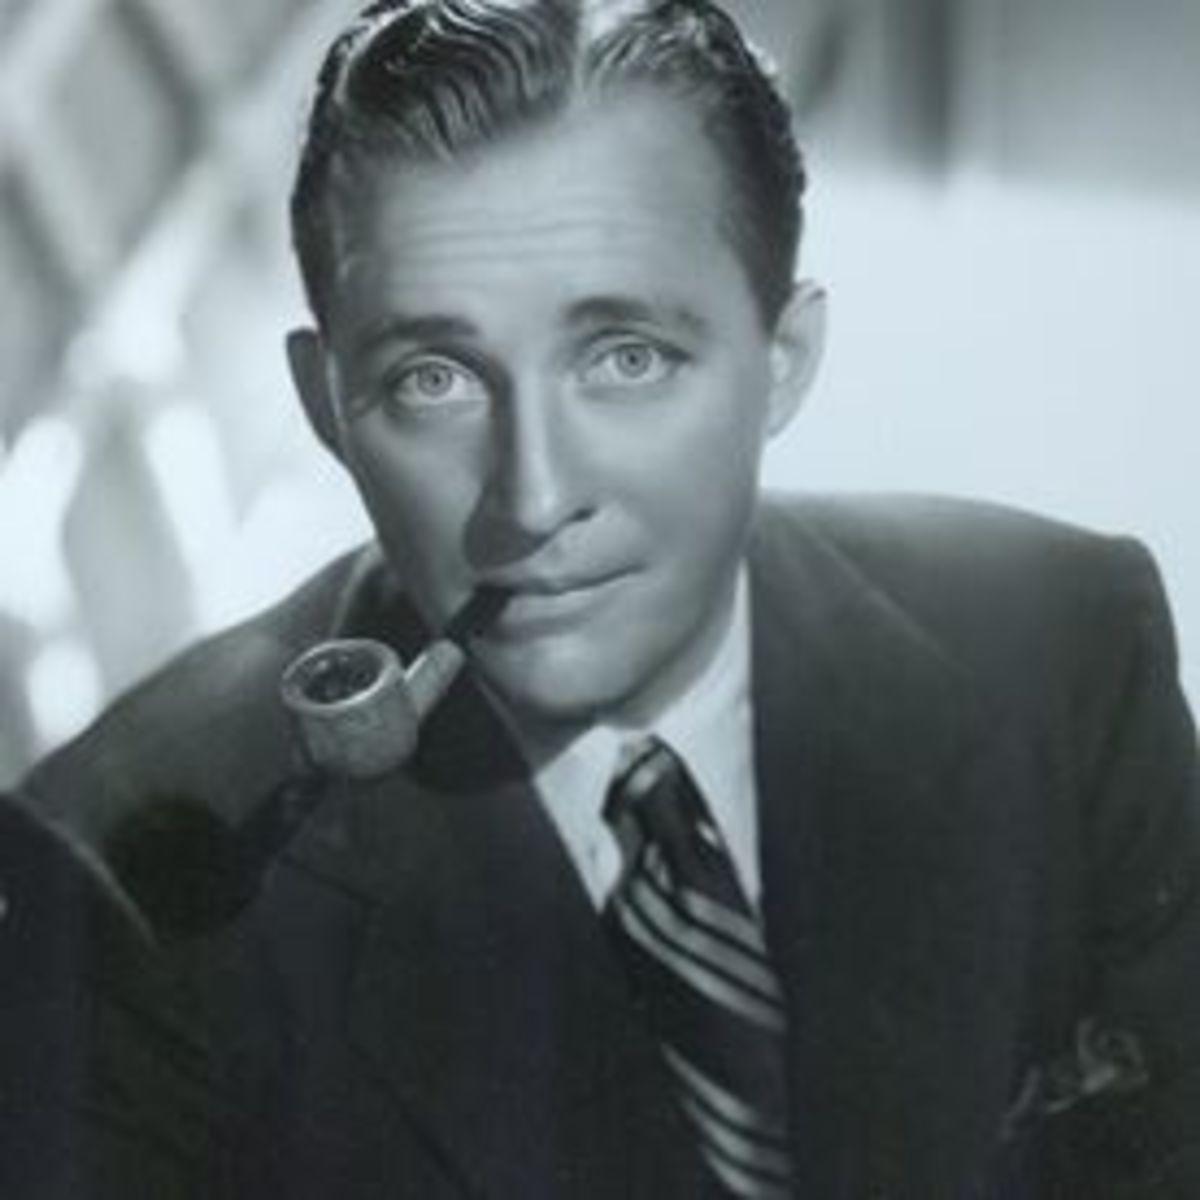 Harry Lillis 'Bing' Crosby